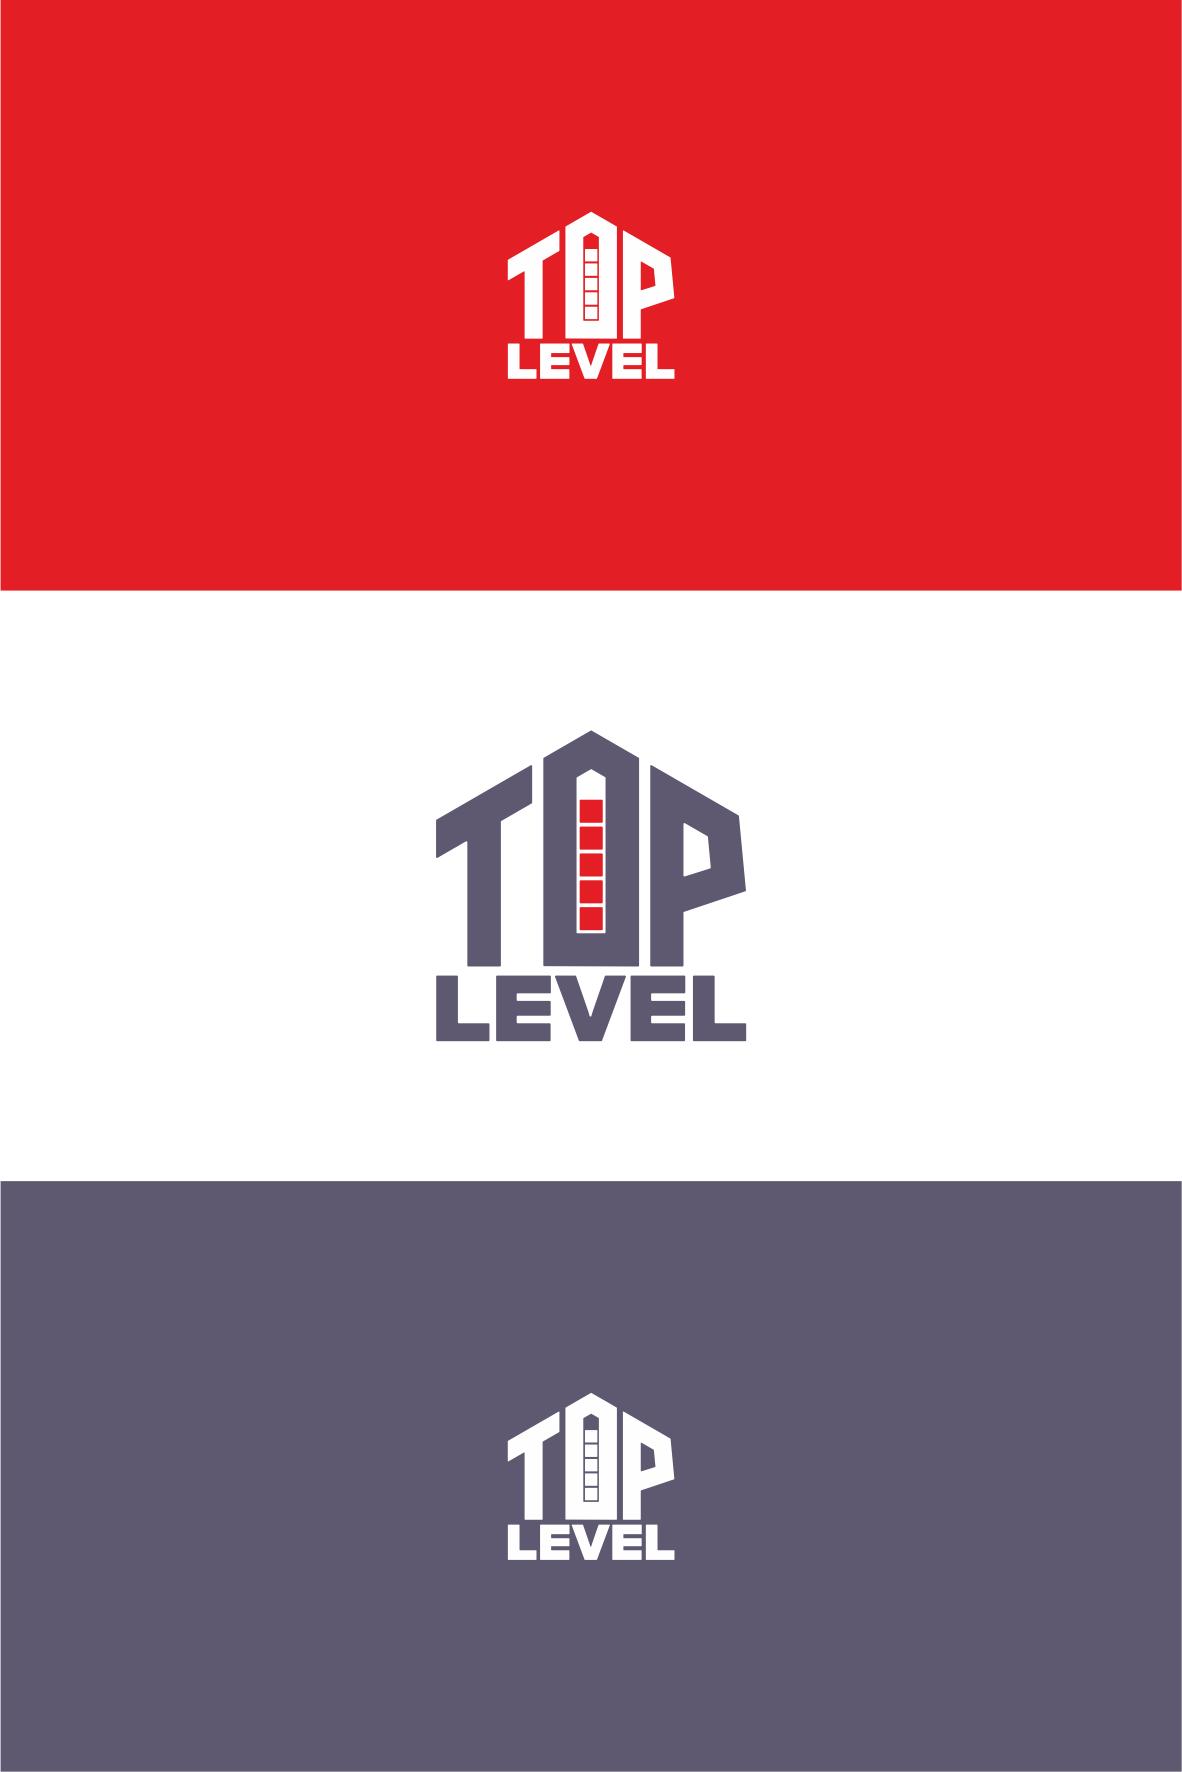 Разработка логотипа для тюнинг ателье фото f_7675f3243fc18db5.png